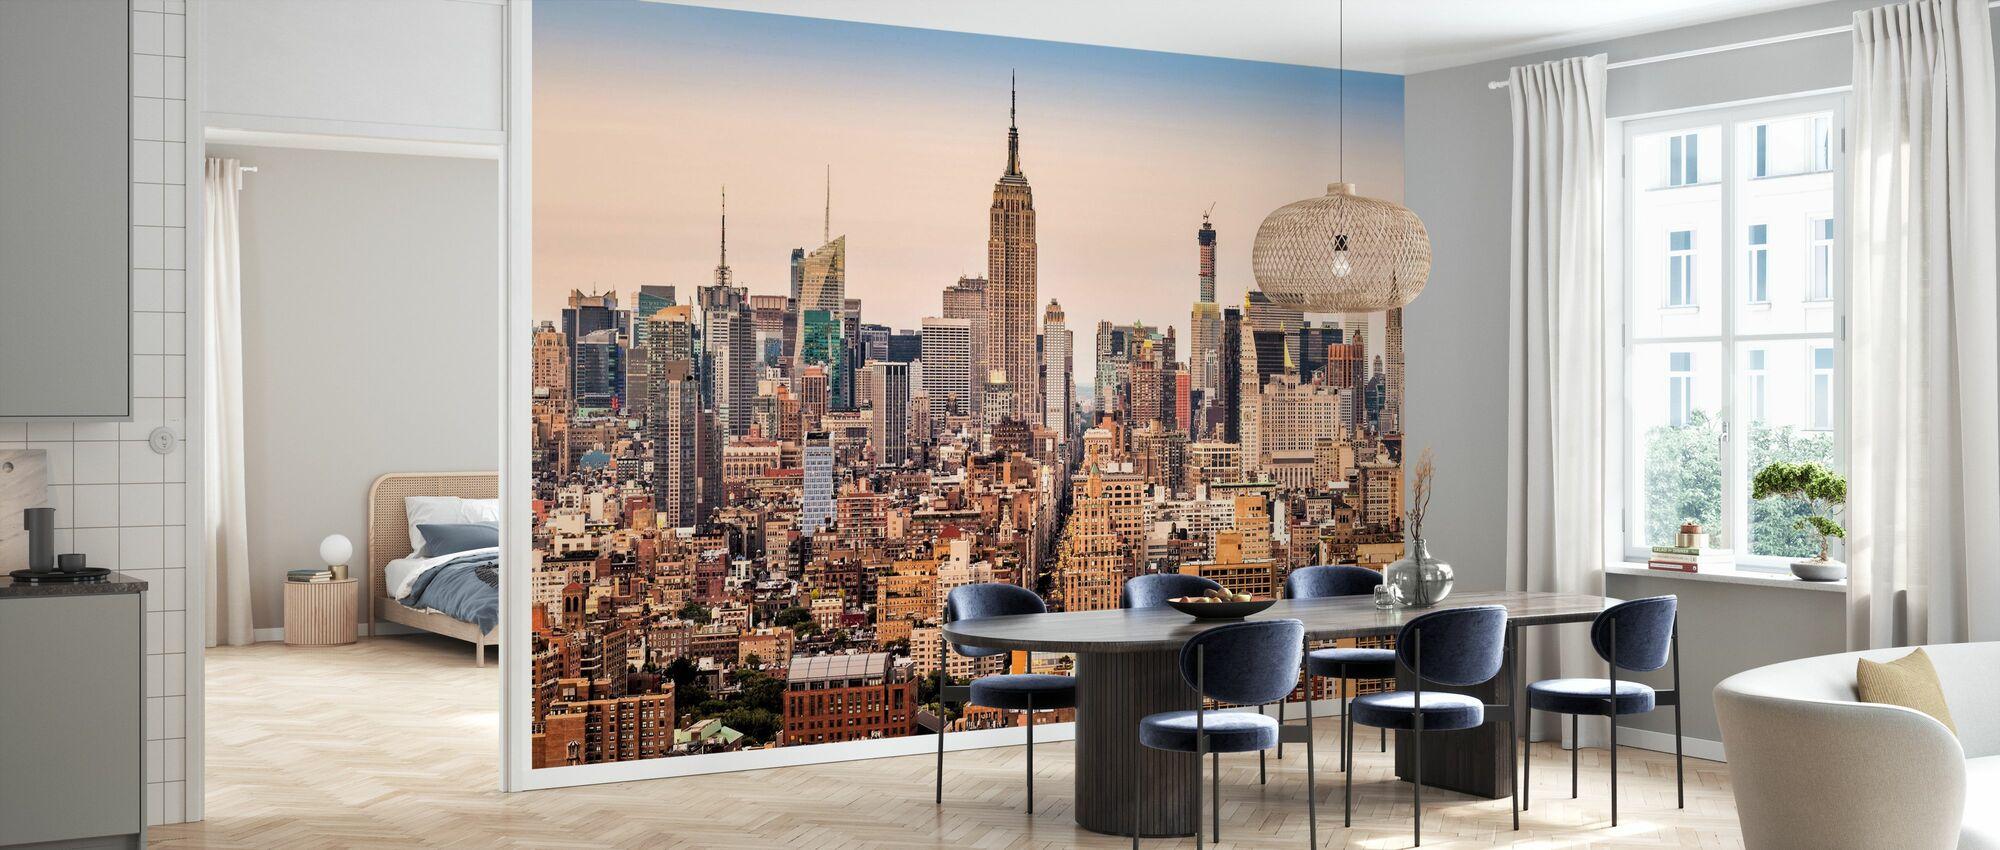 New York Midtown - Wallpaper - Kitchen